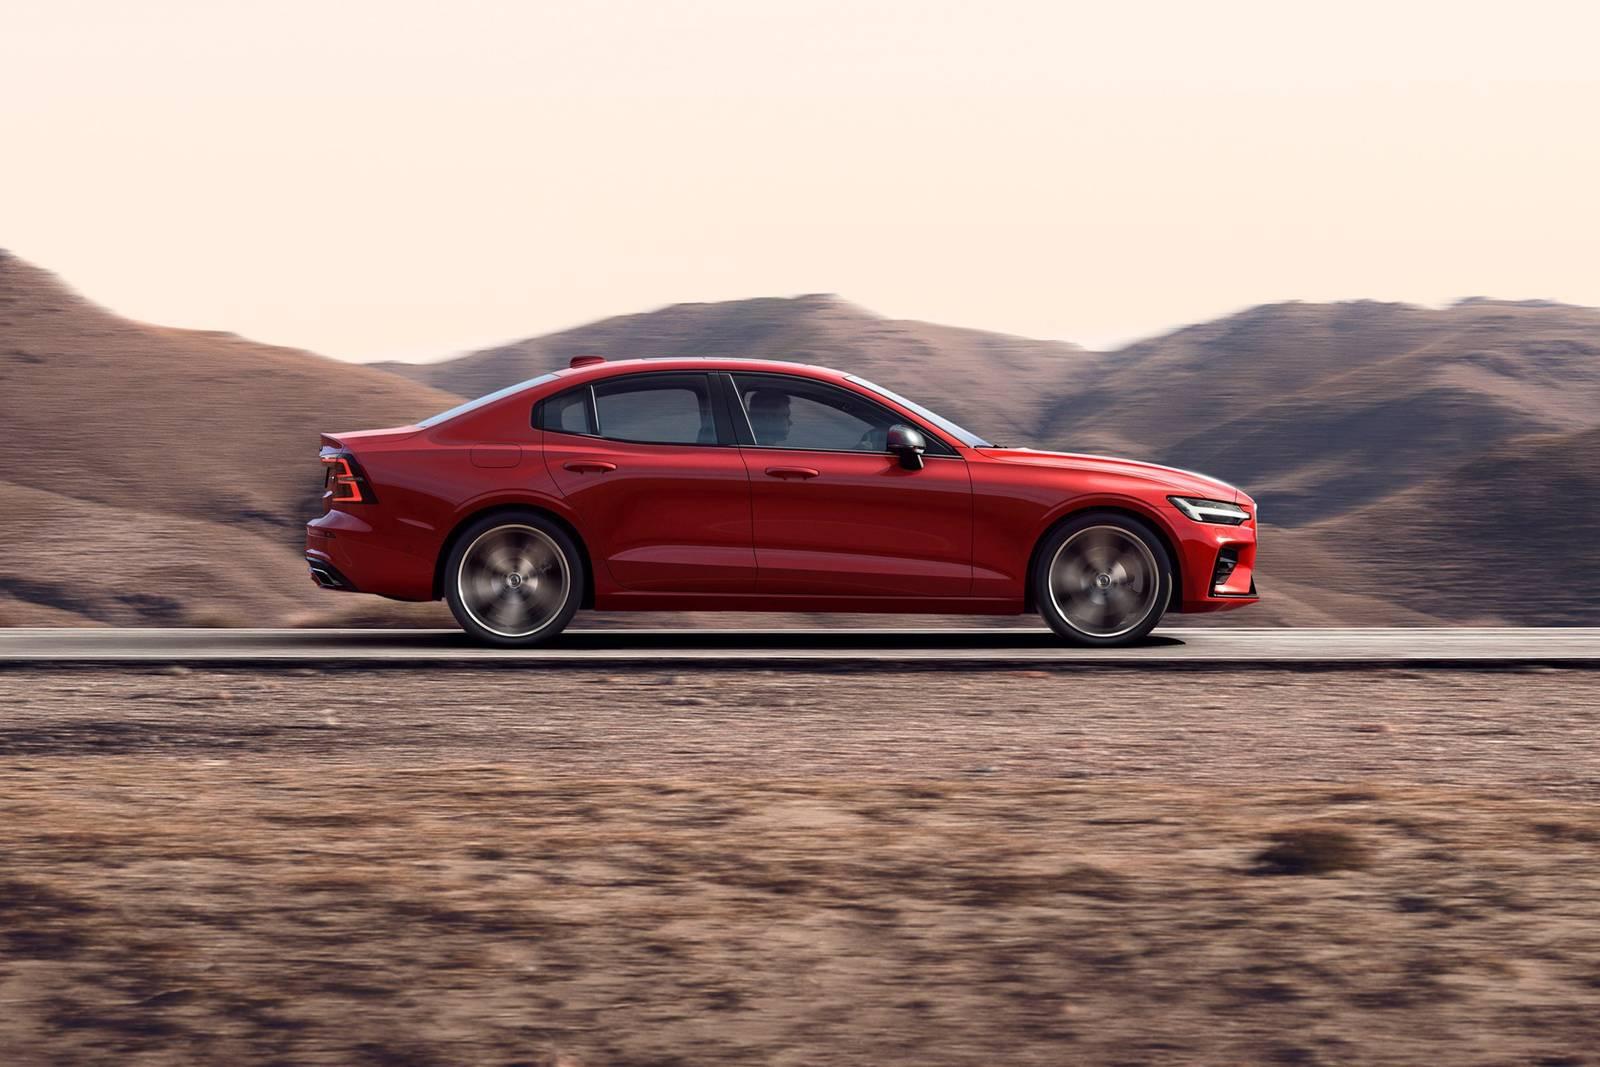 2019 Volvo S60 T6 R-Design in Fusion Red Metallic